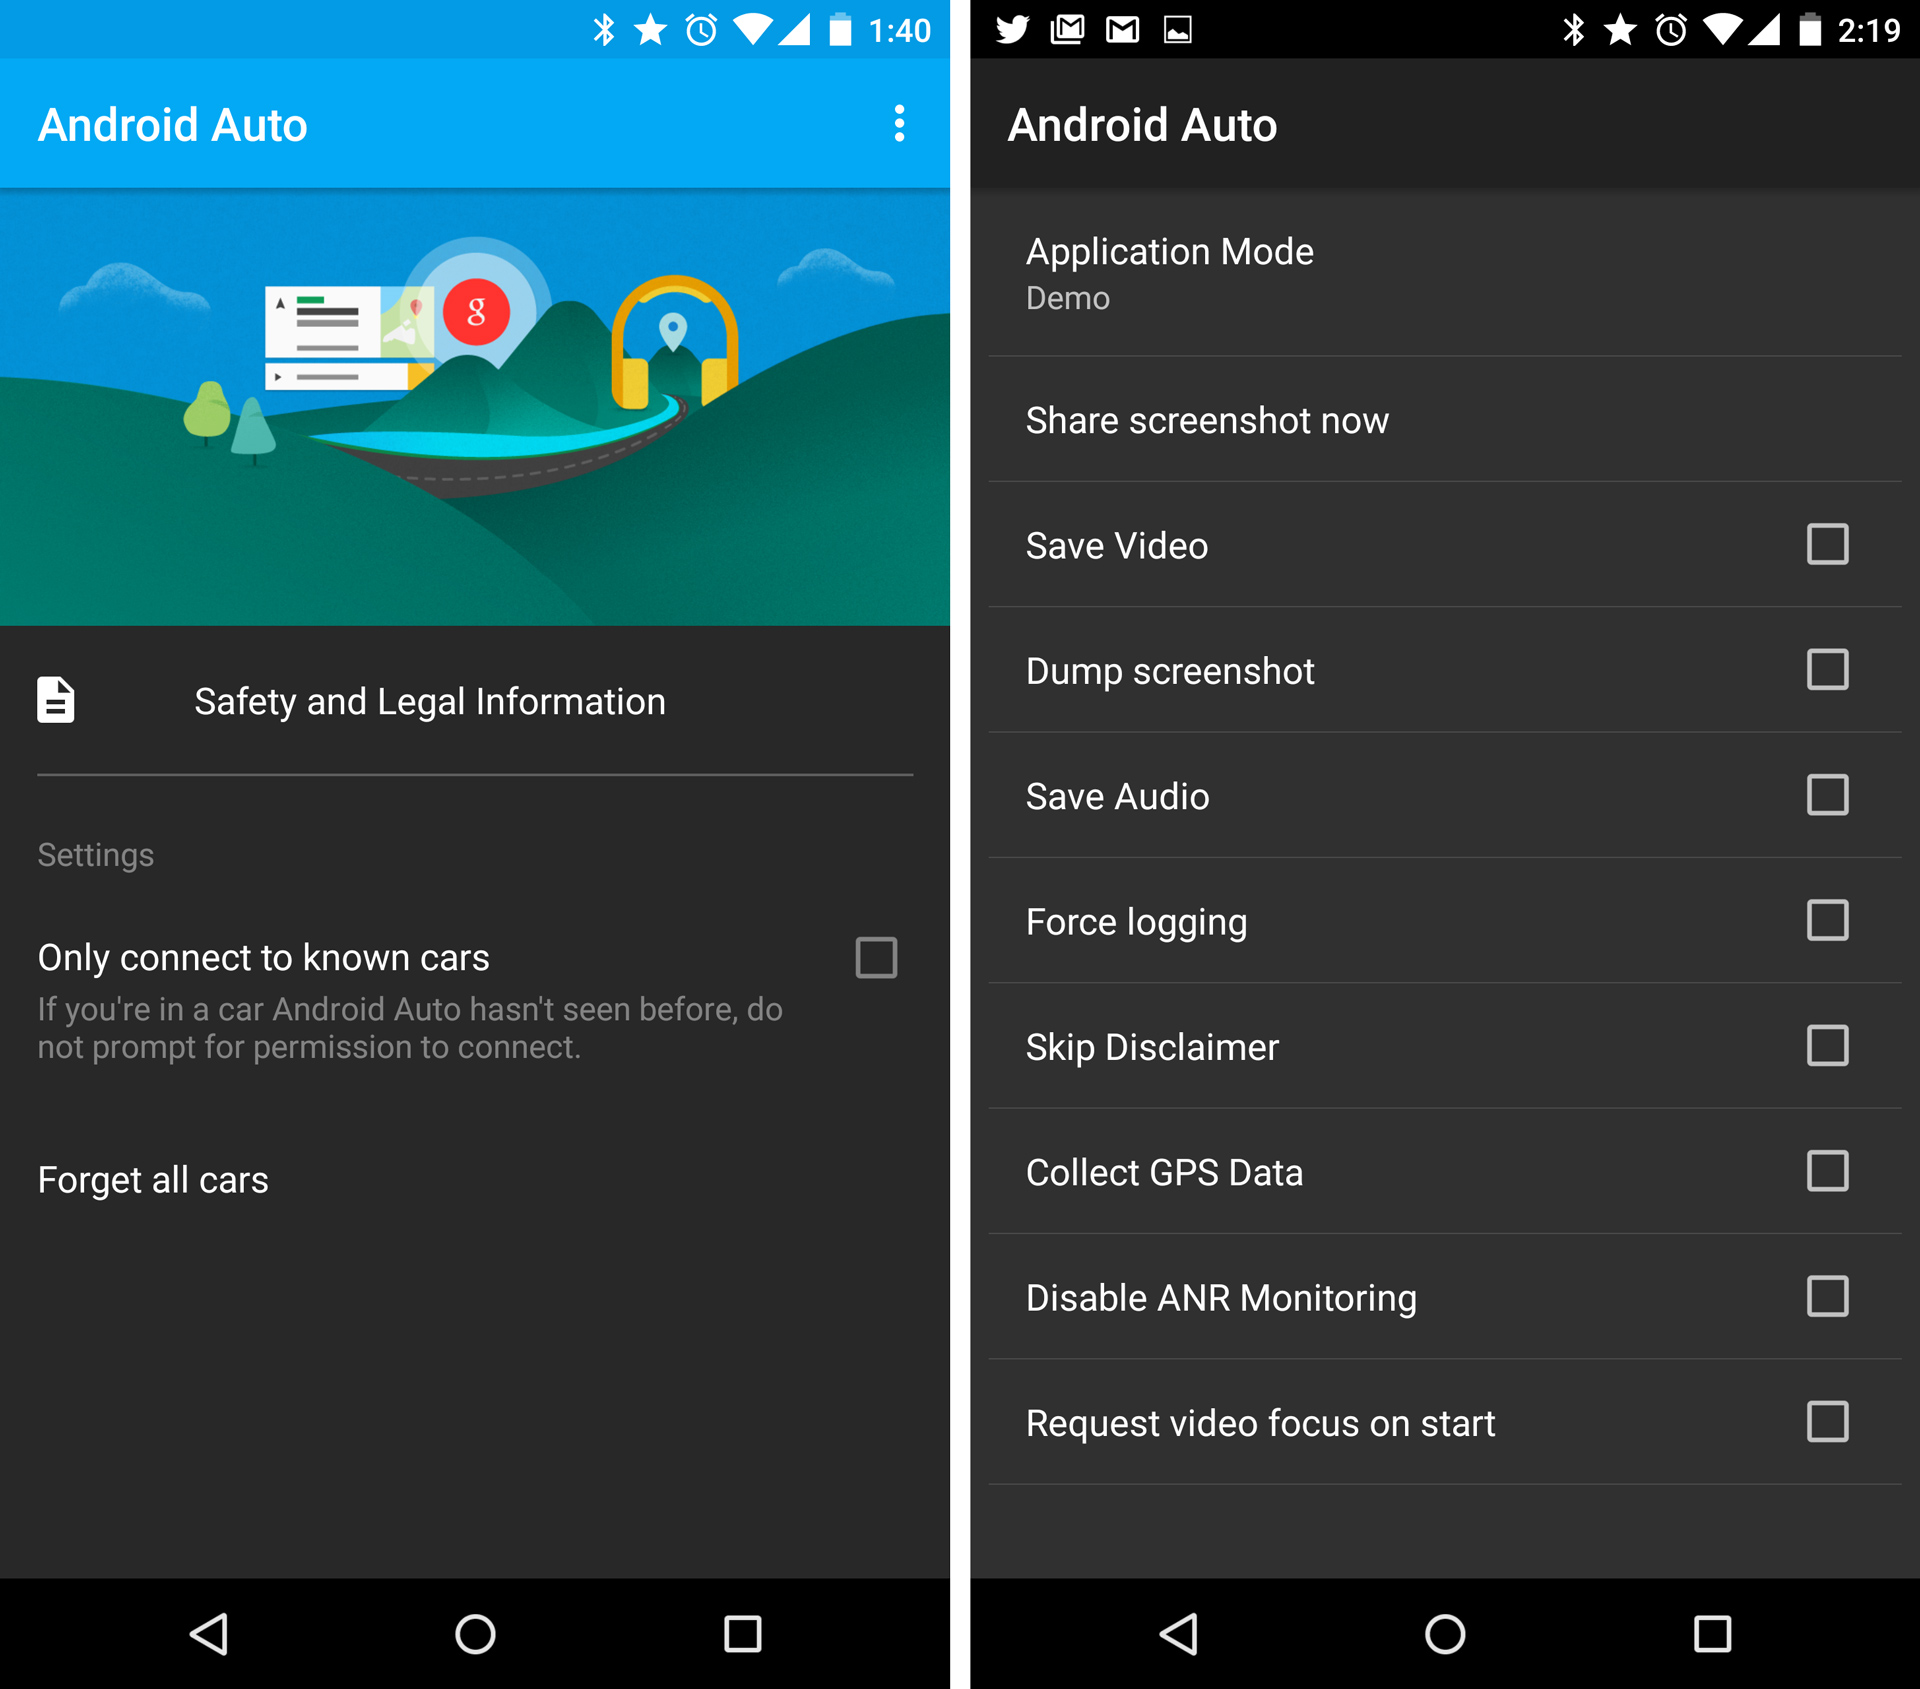 Left: The Android Auto app. Right: The developer menu.